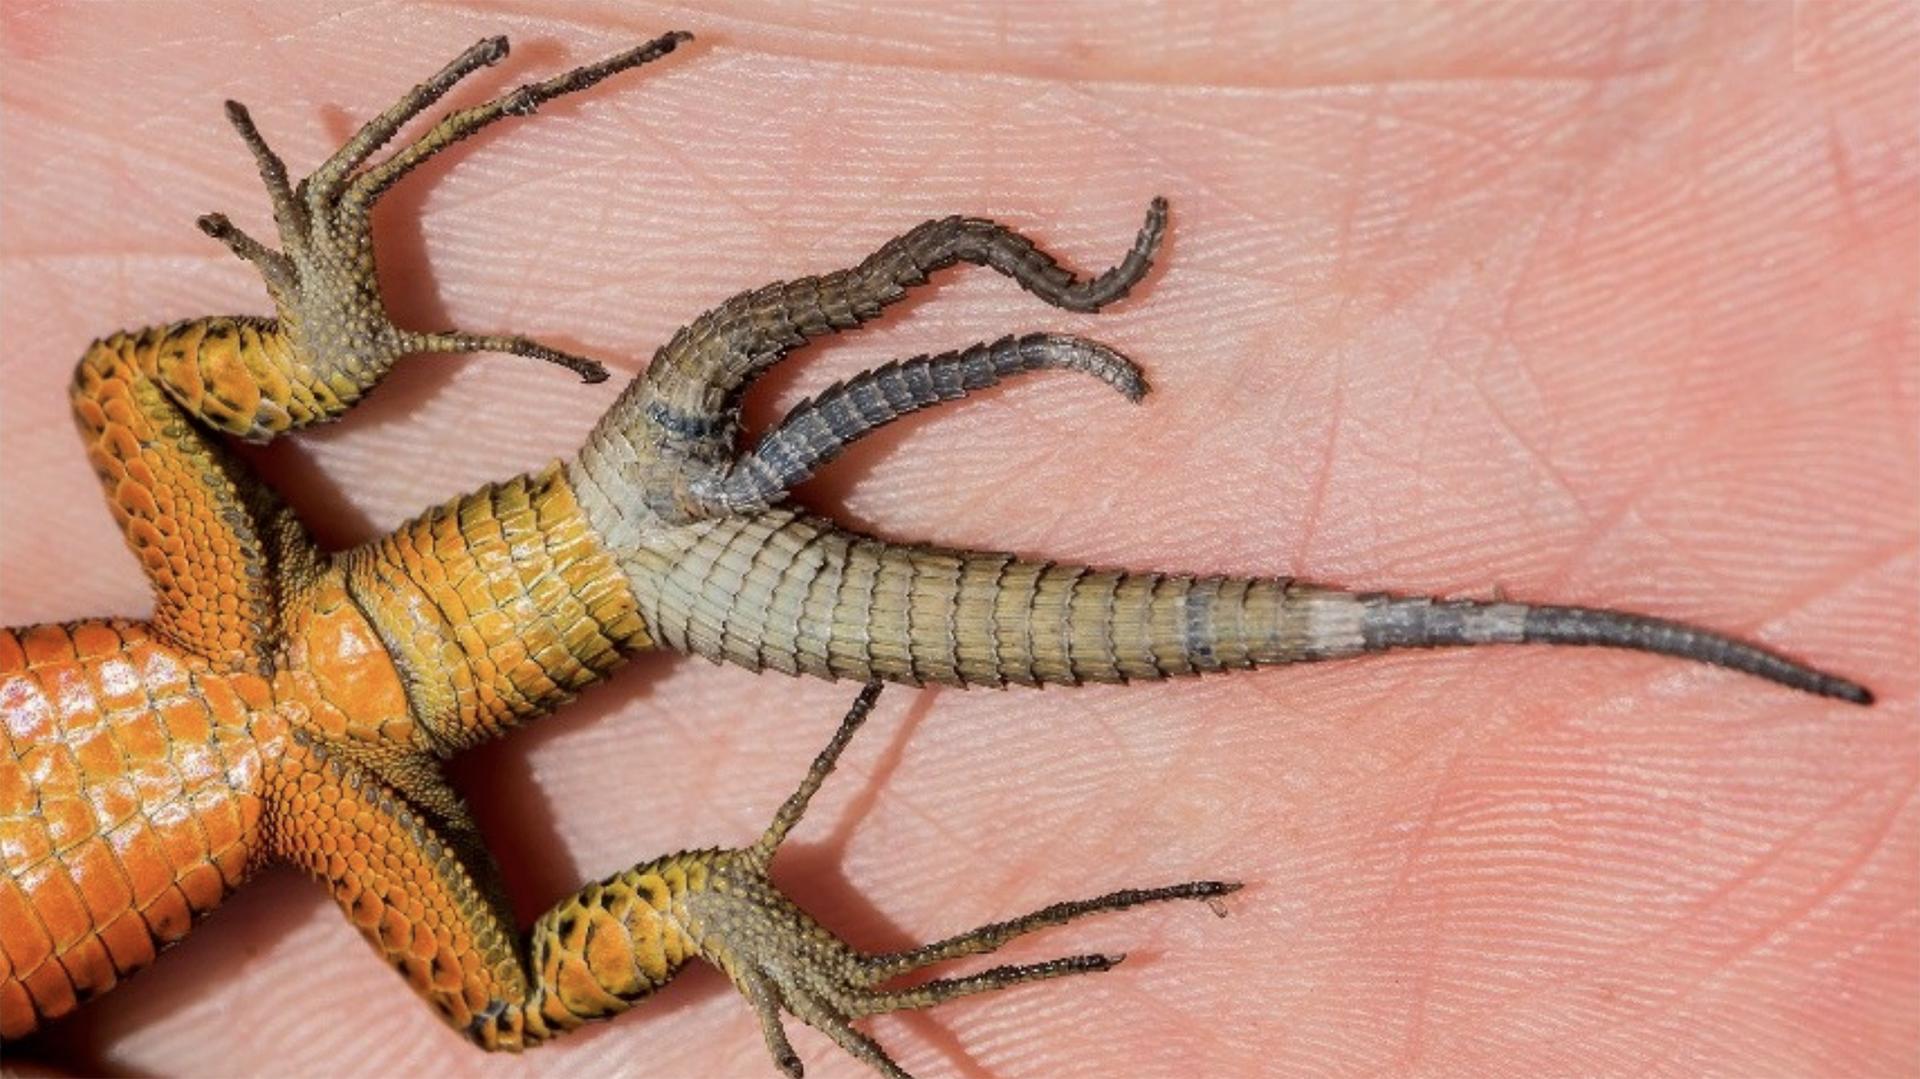 Lagartos podem regenerar múltiplas caudas